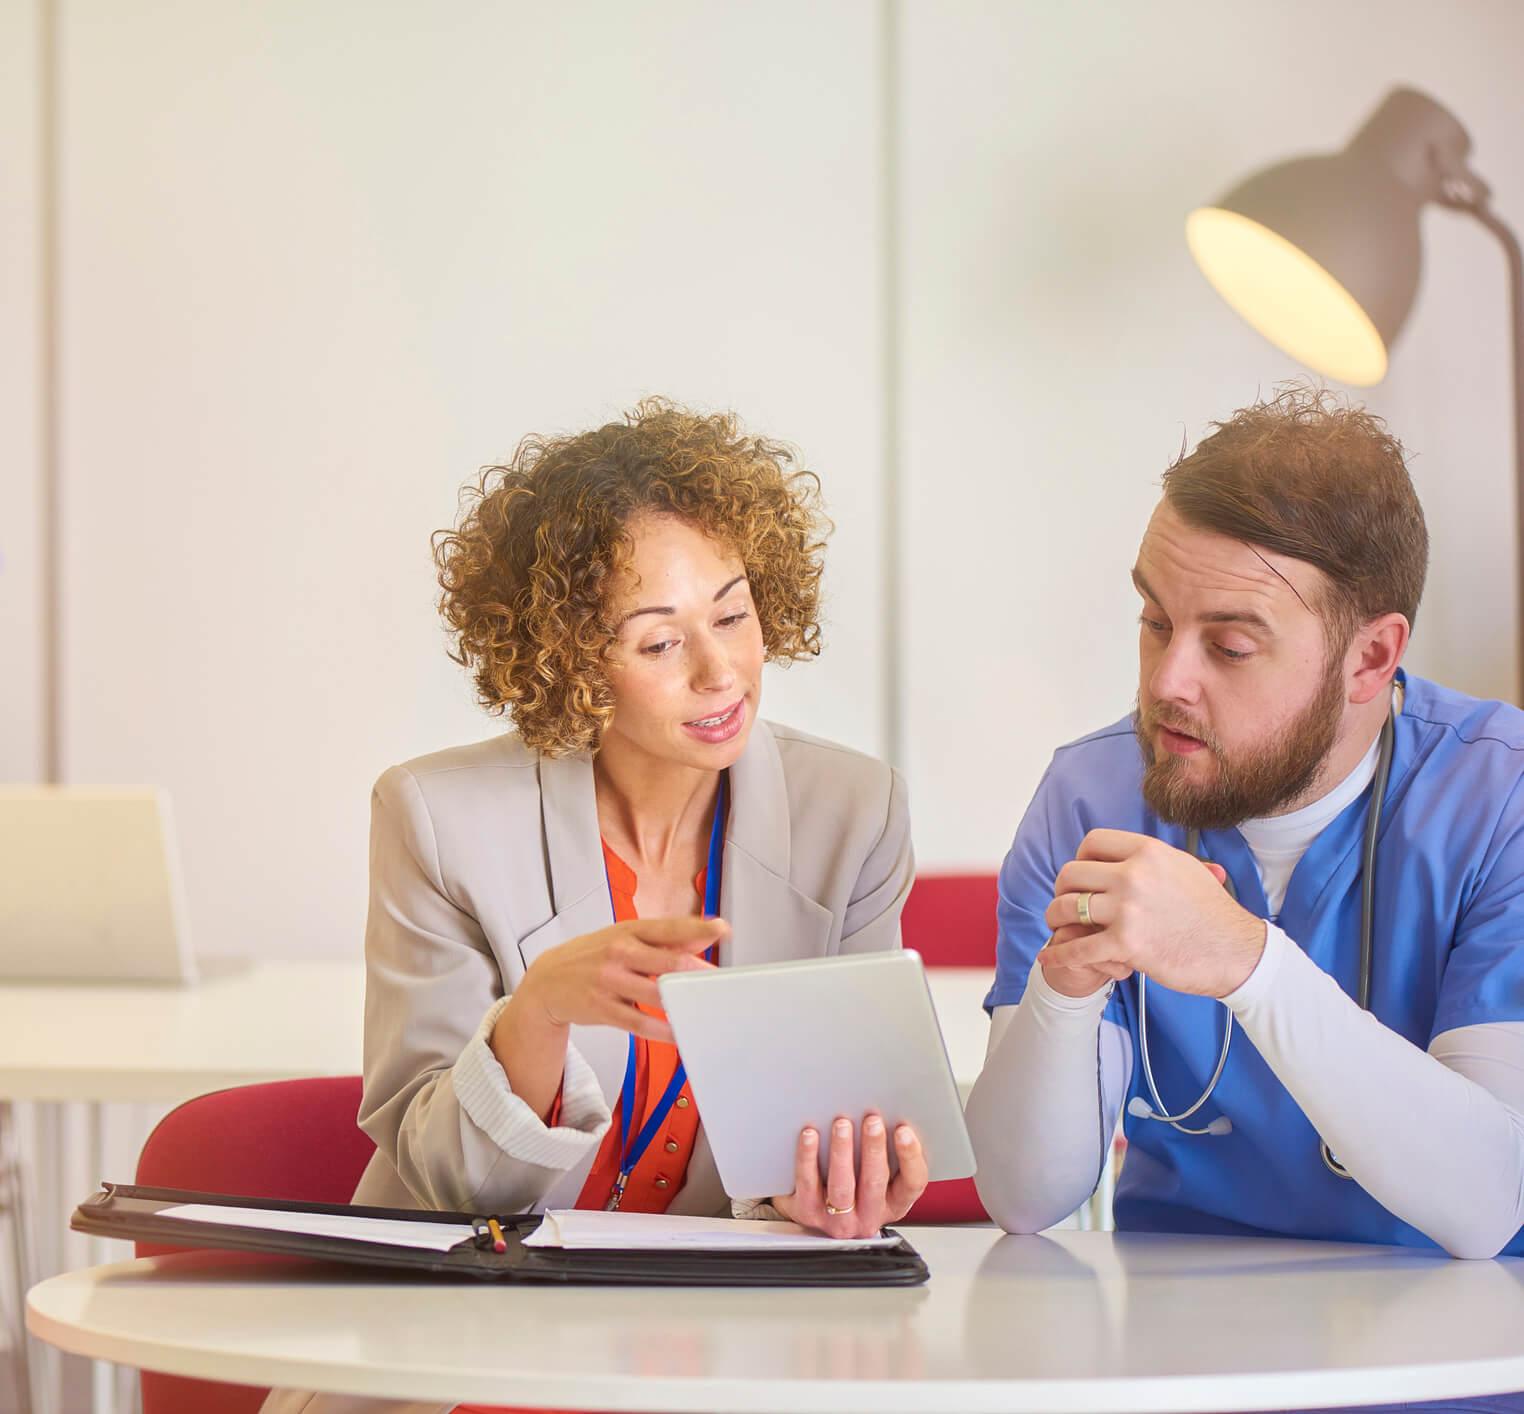 What Does a Nursing Professional Development Specialist Do?